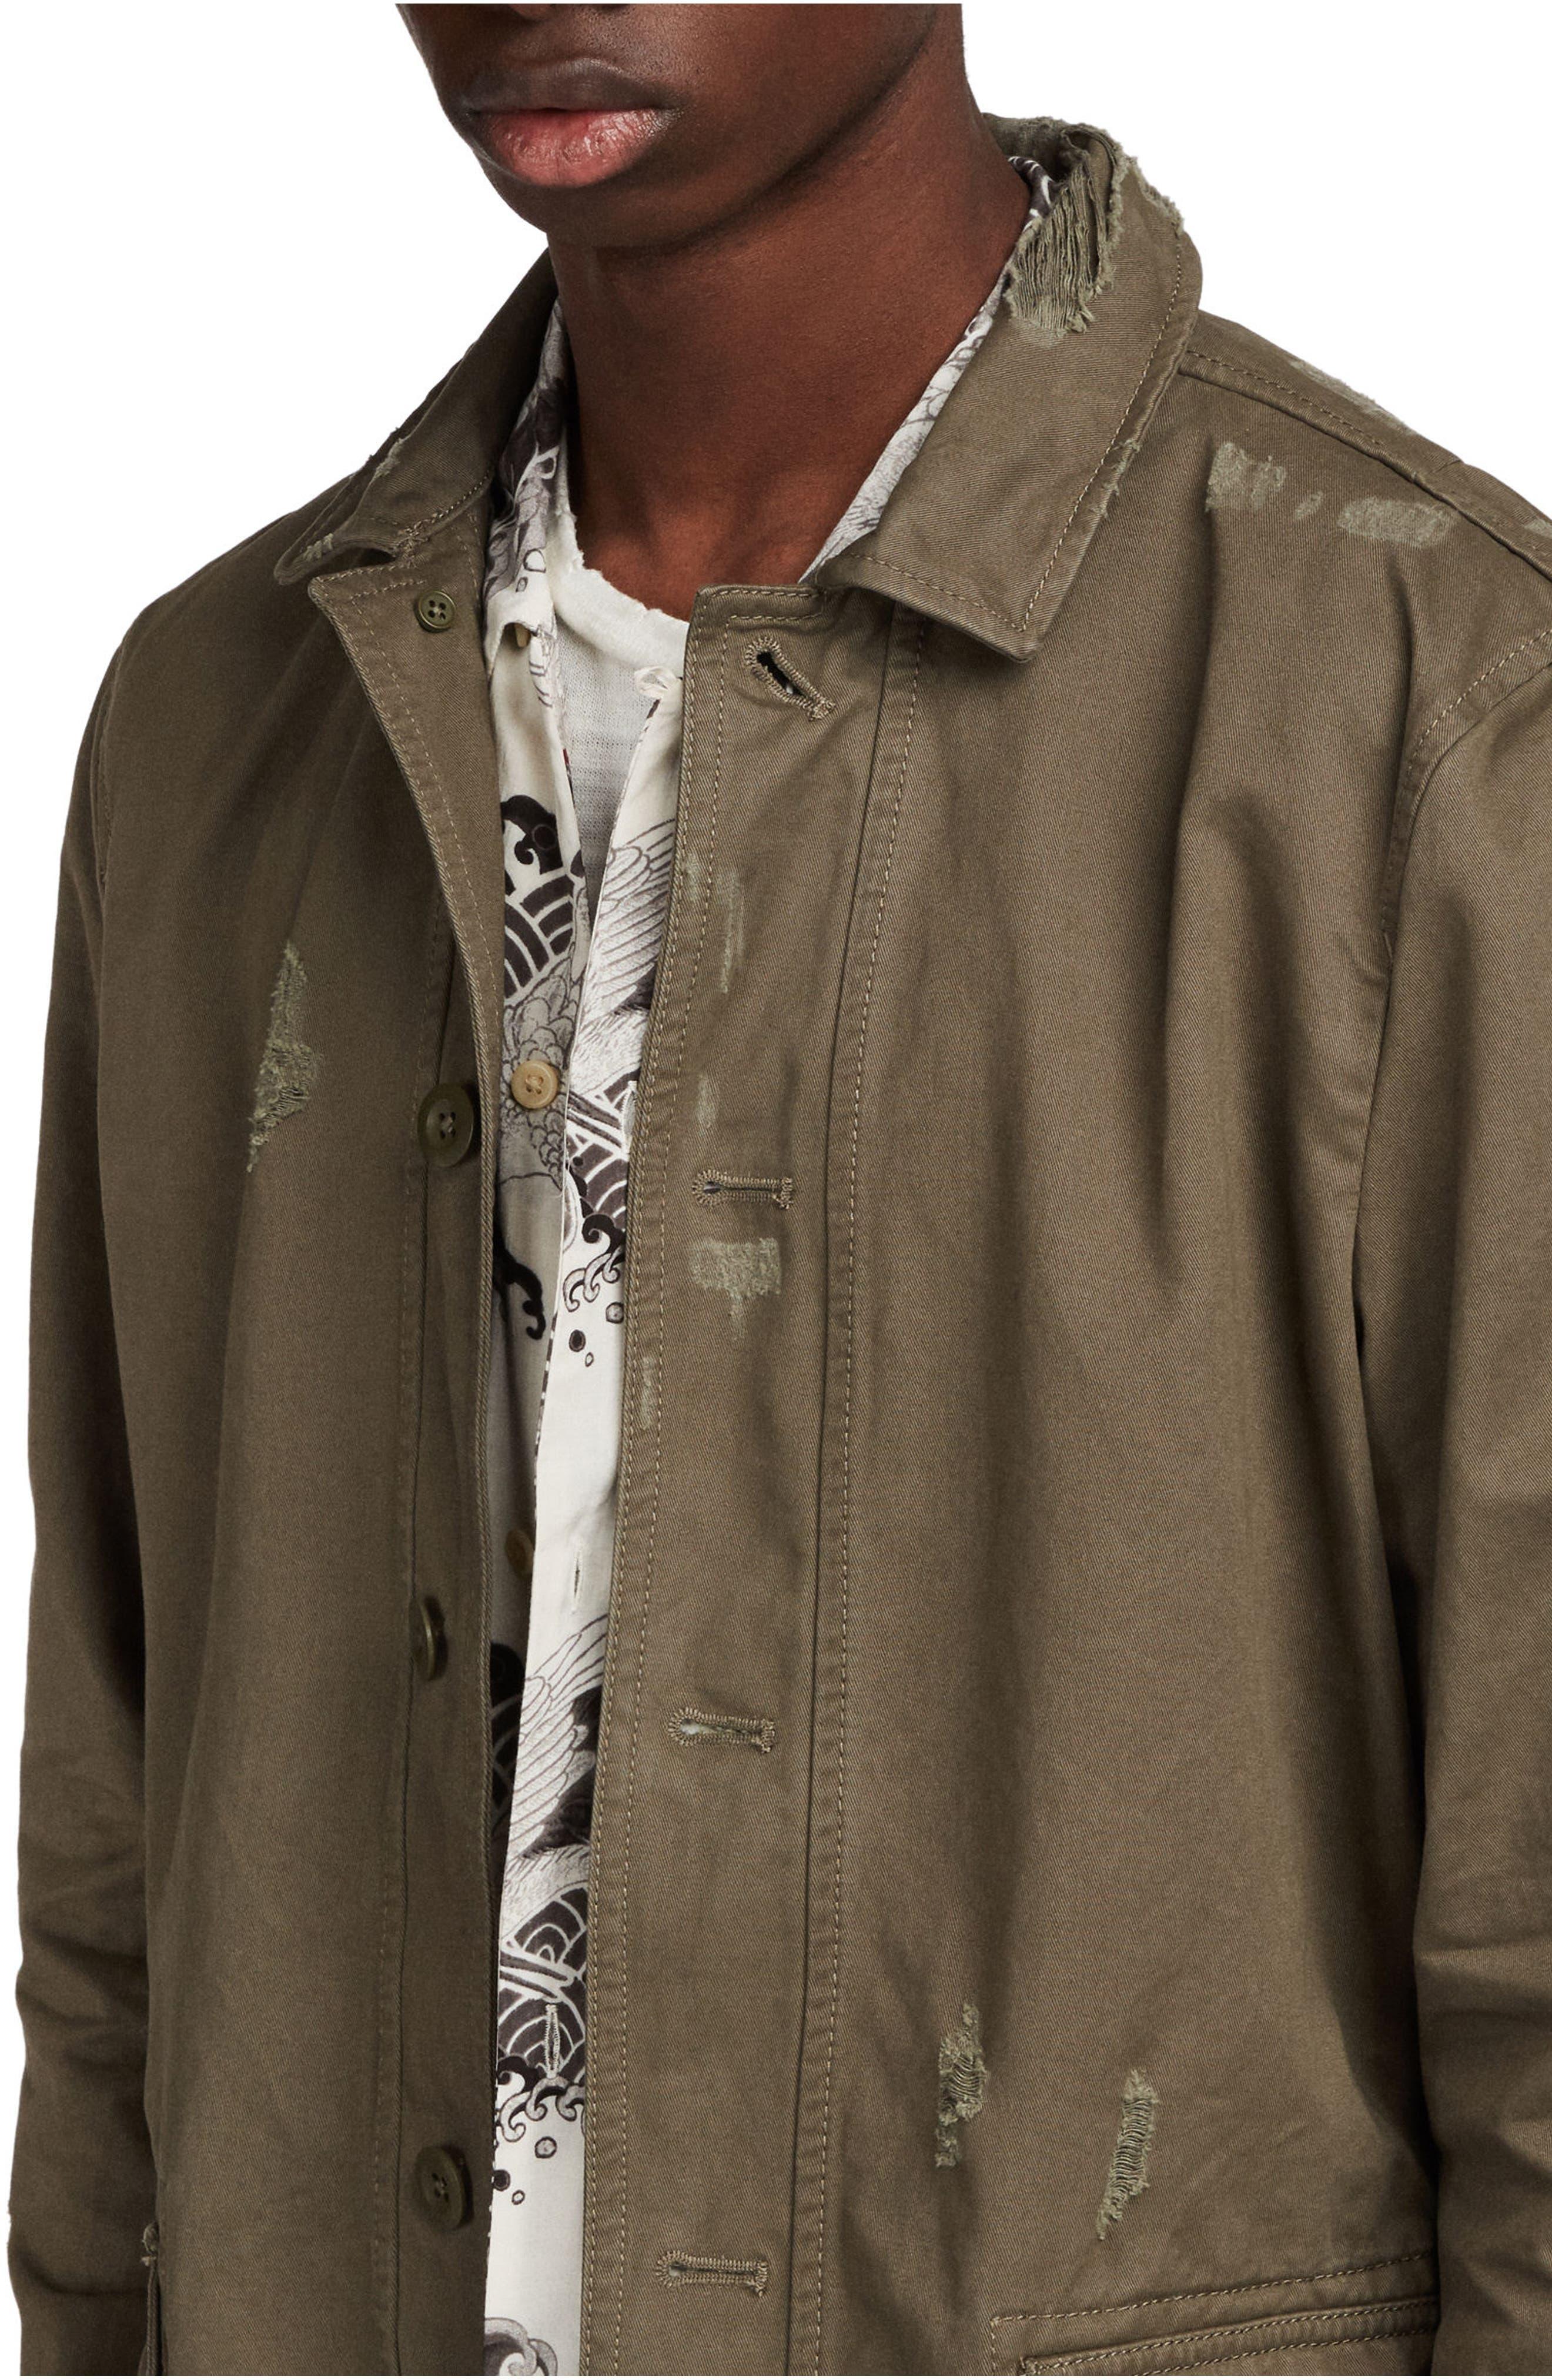 Sasaki Shirt Jacket,                             Alternate thumbnail 5, color,                             Khaki Green